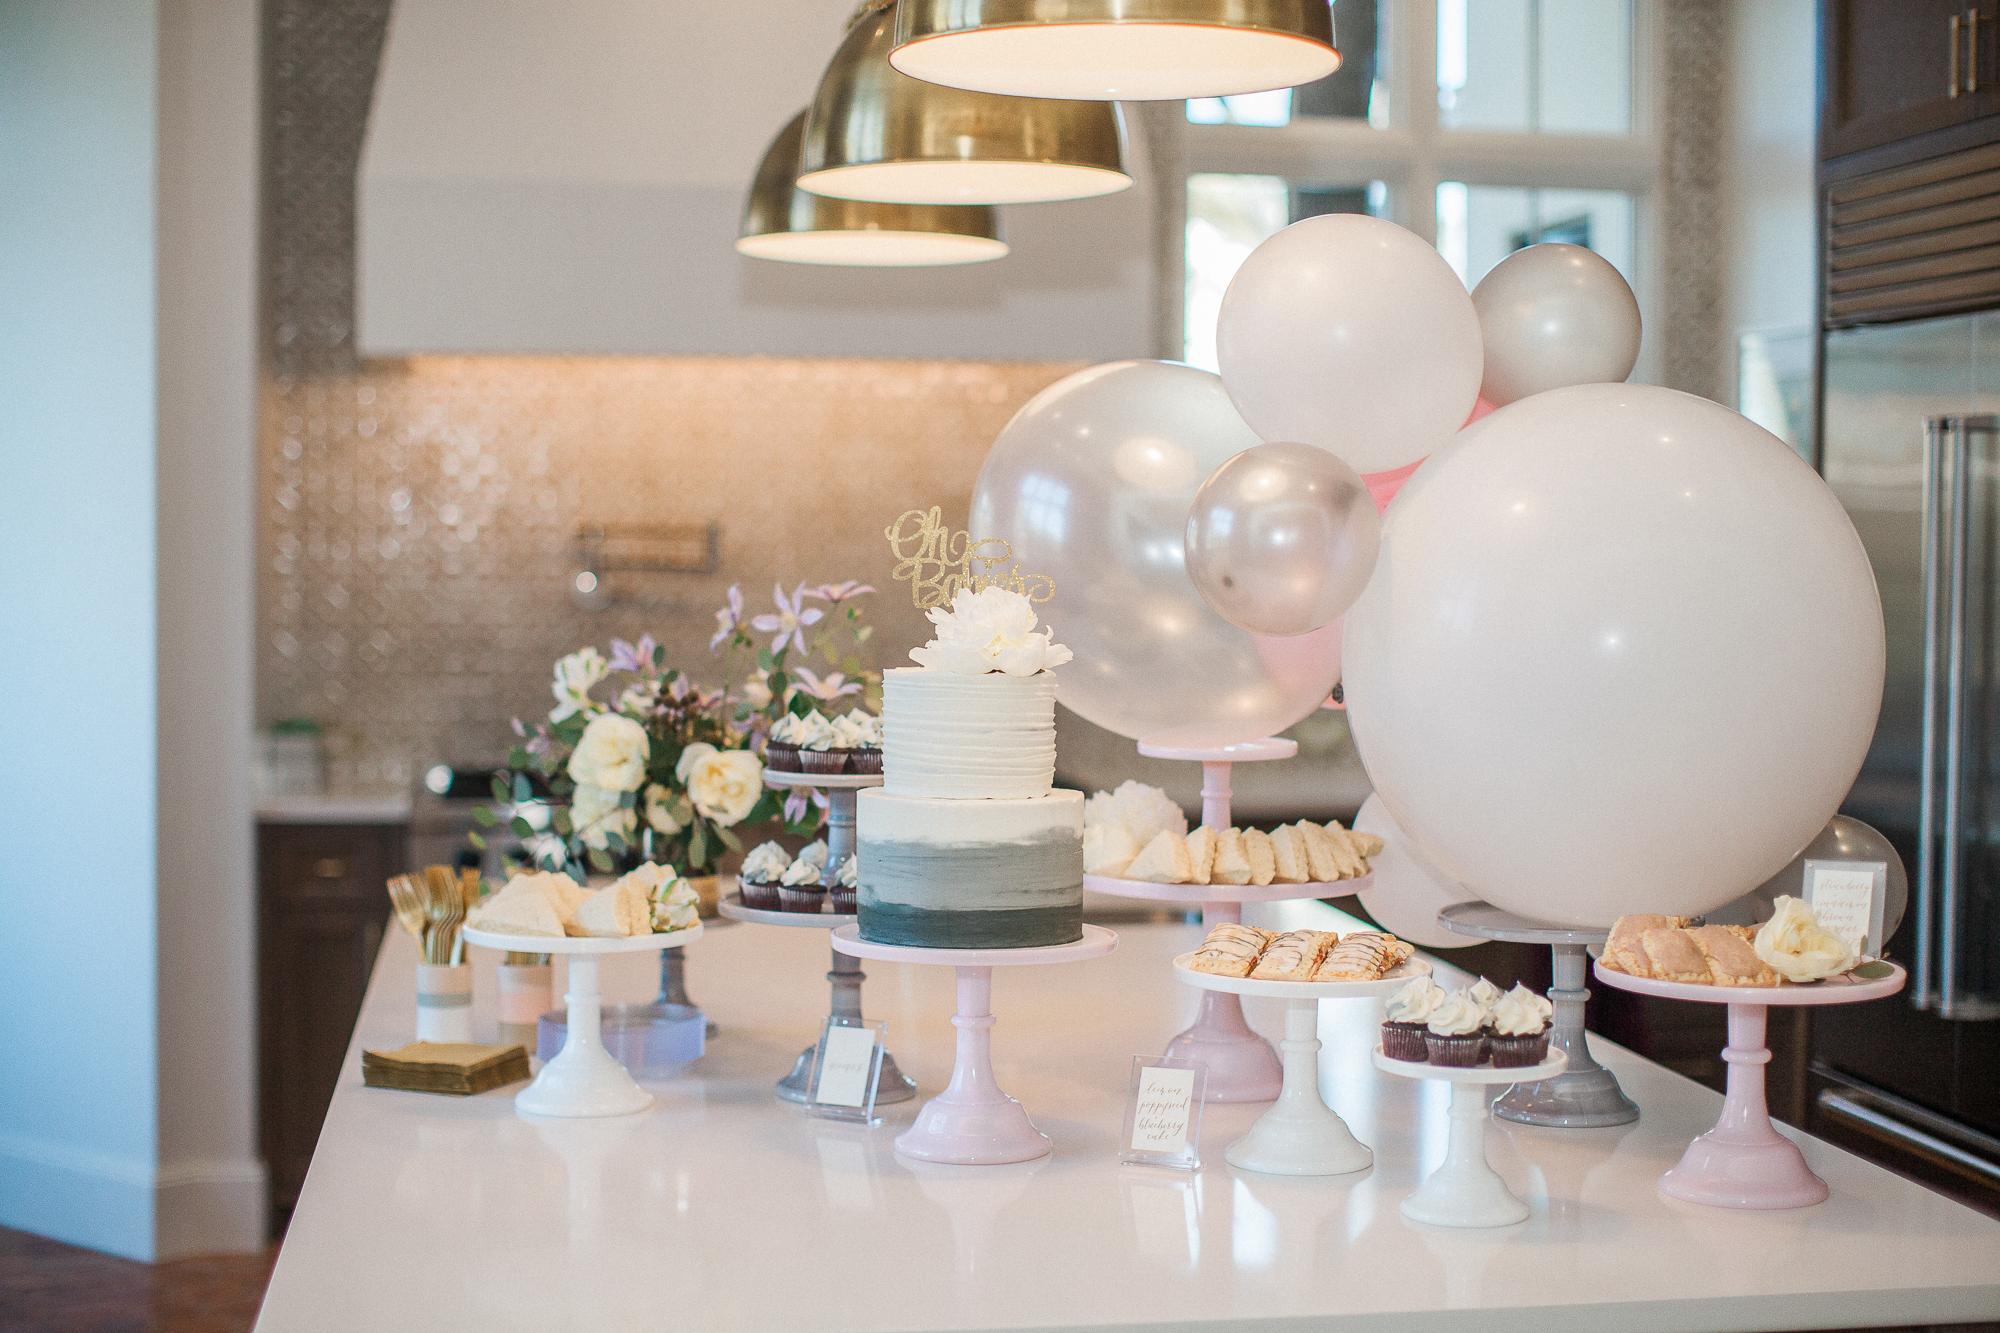 The final dessert table